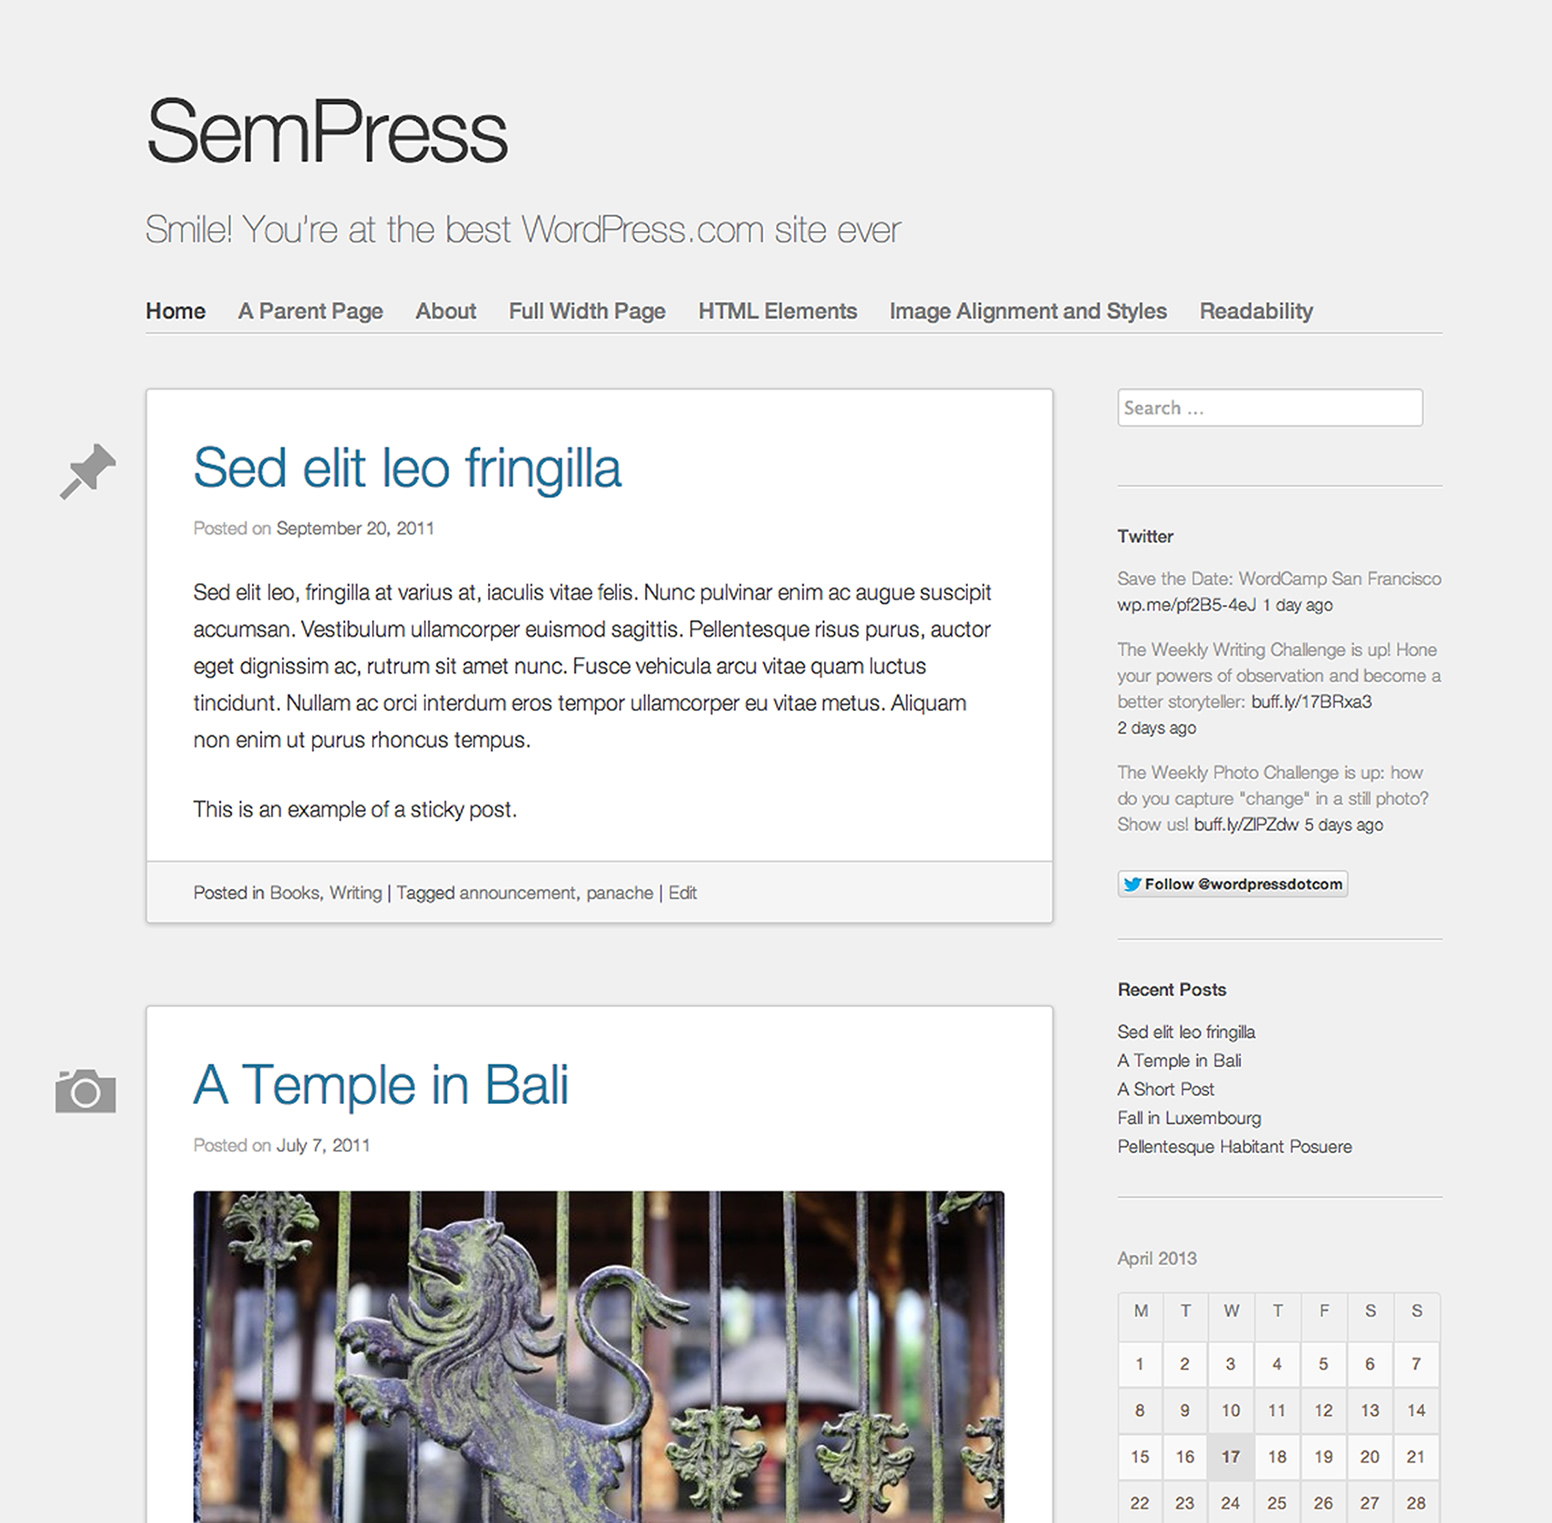 SemPress